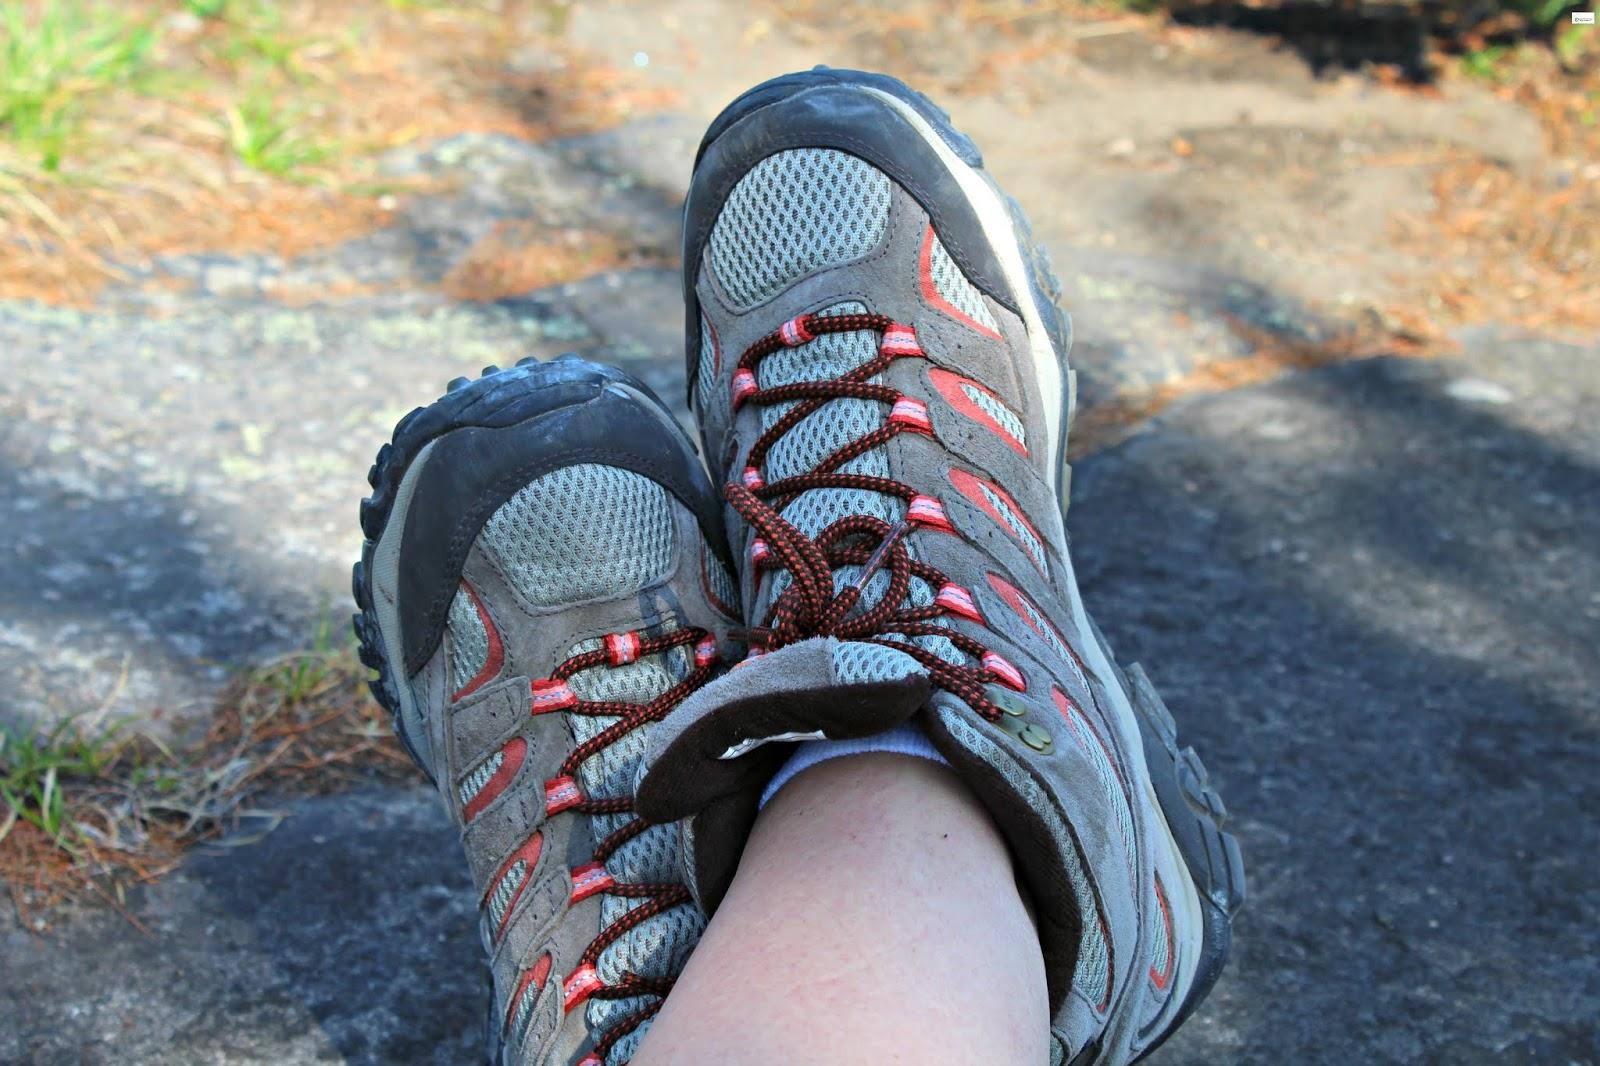 edb7784d7d7 My Favorite Hiking Boot | Caravan Sonnet